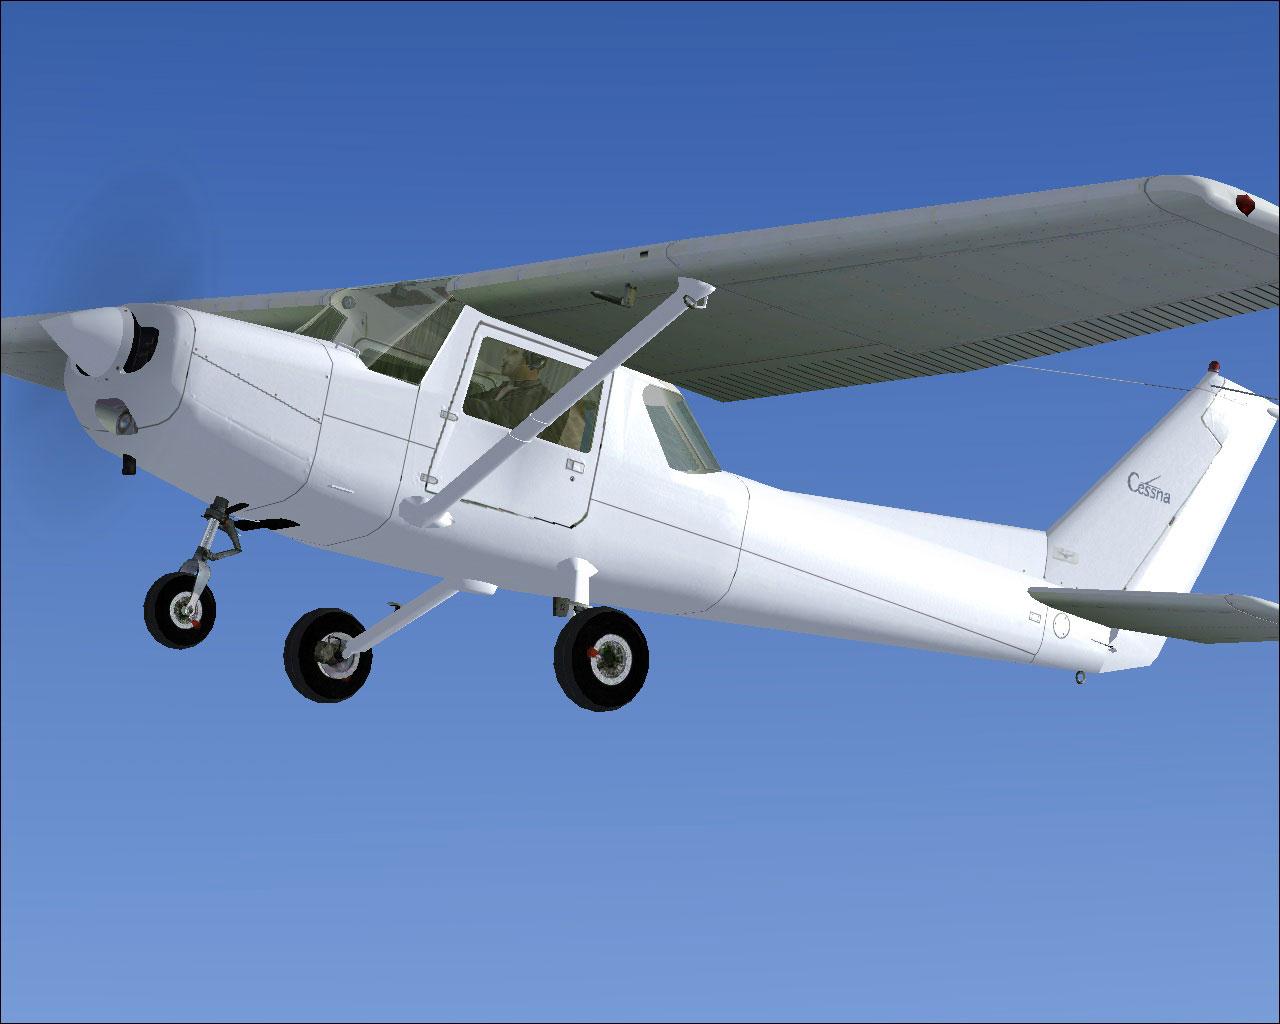 Cessna 152 Propeller